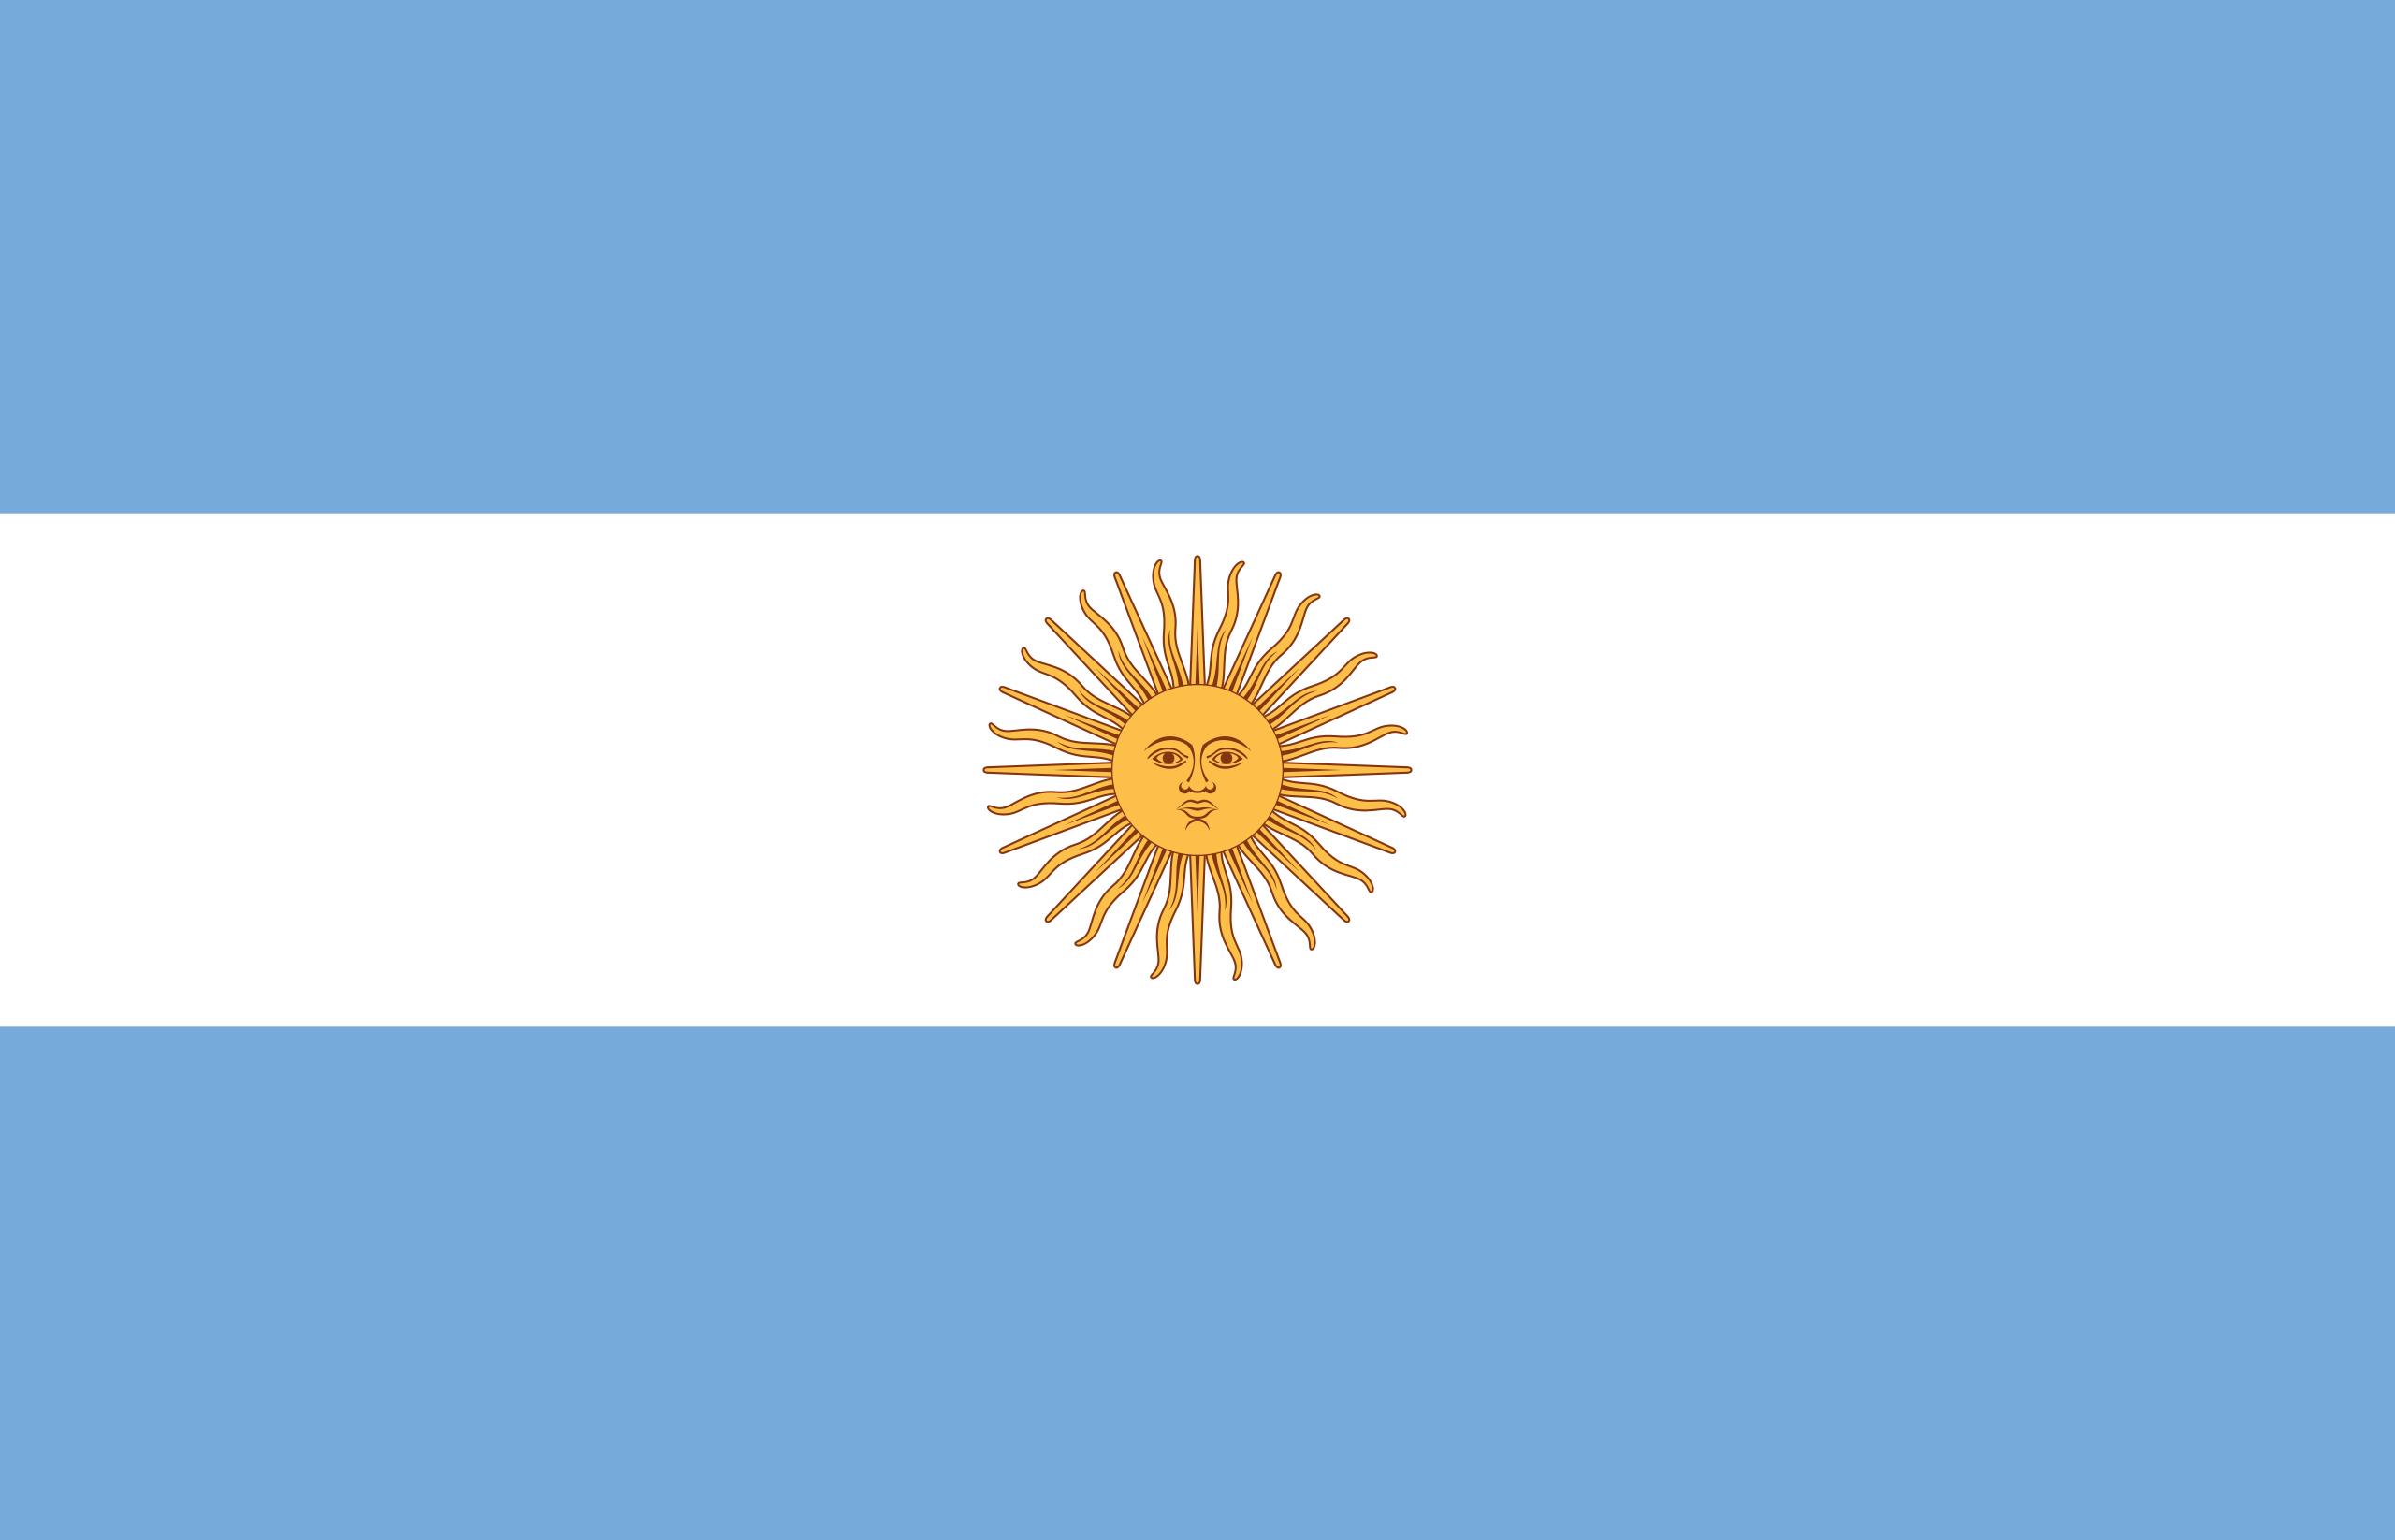 Argentina, paese, emblema, logo, simbolo - Sfondi HD - Professor-falken.com